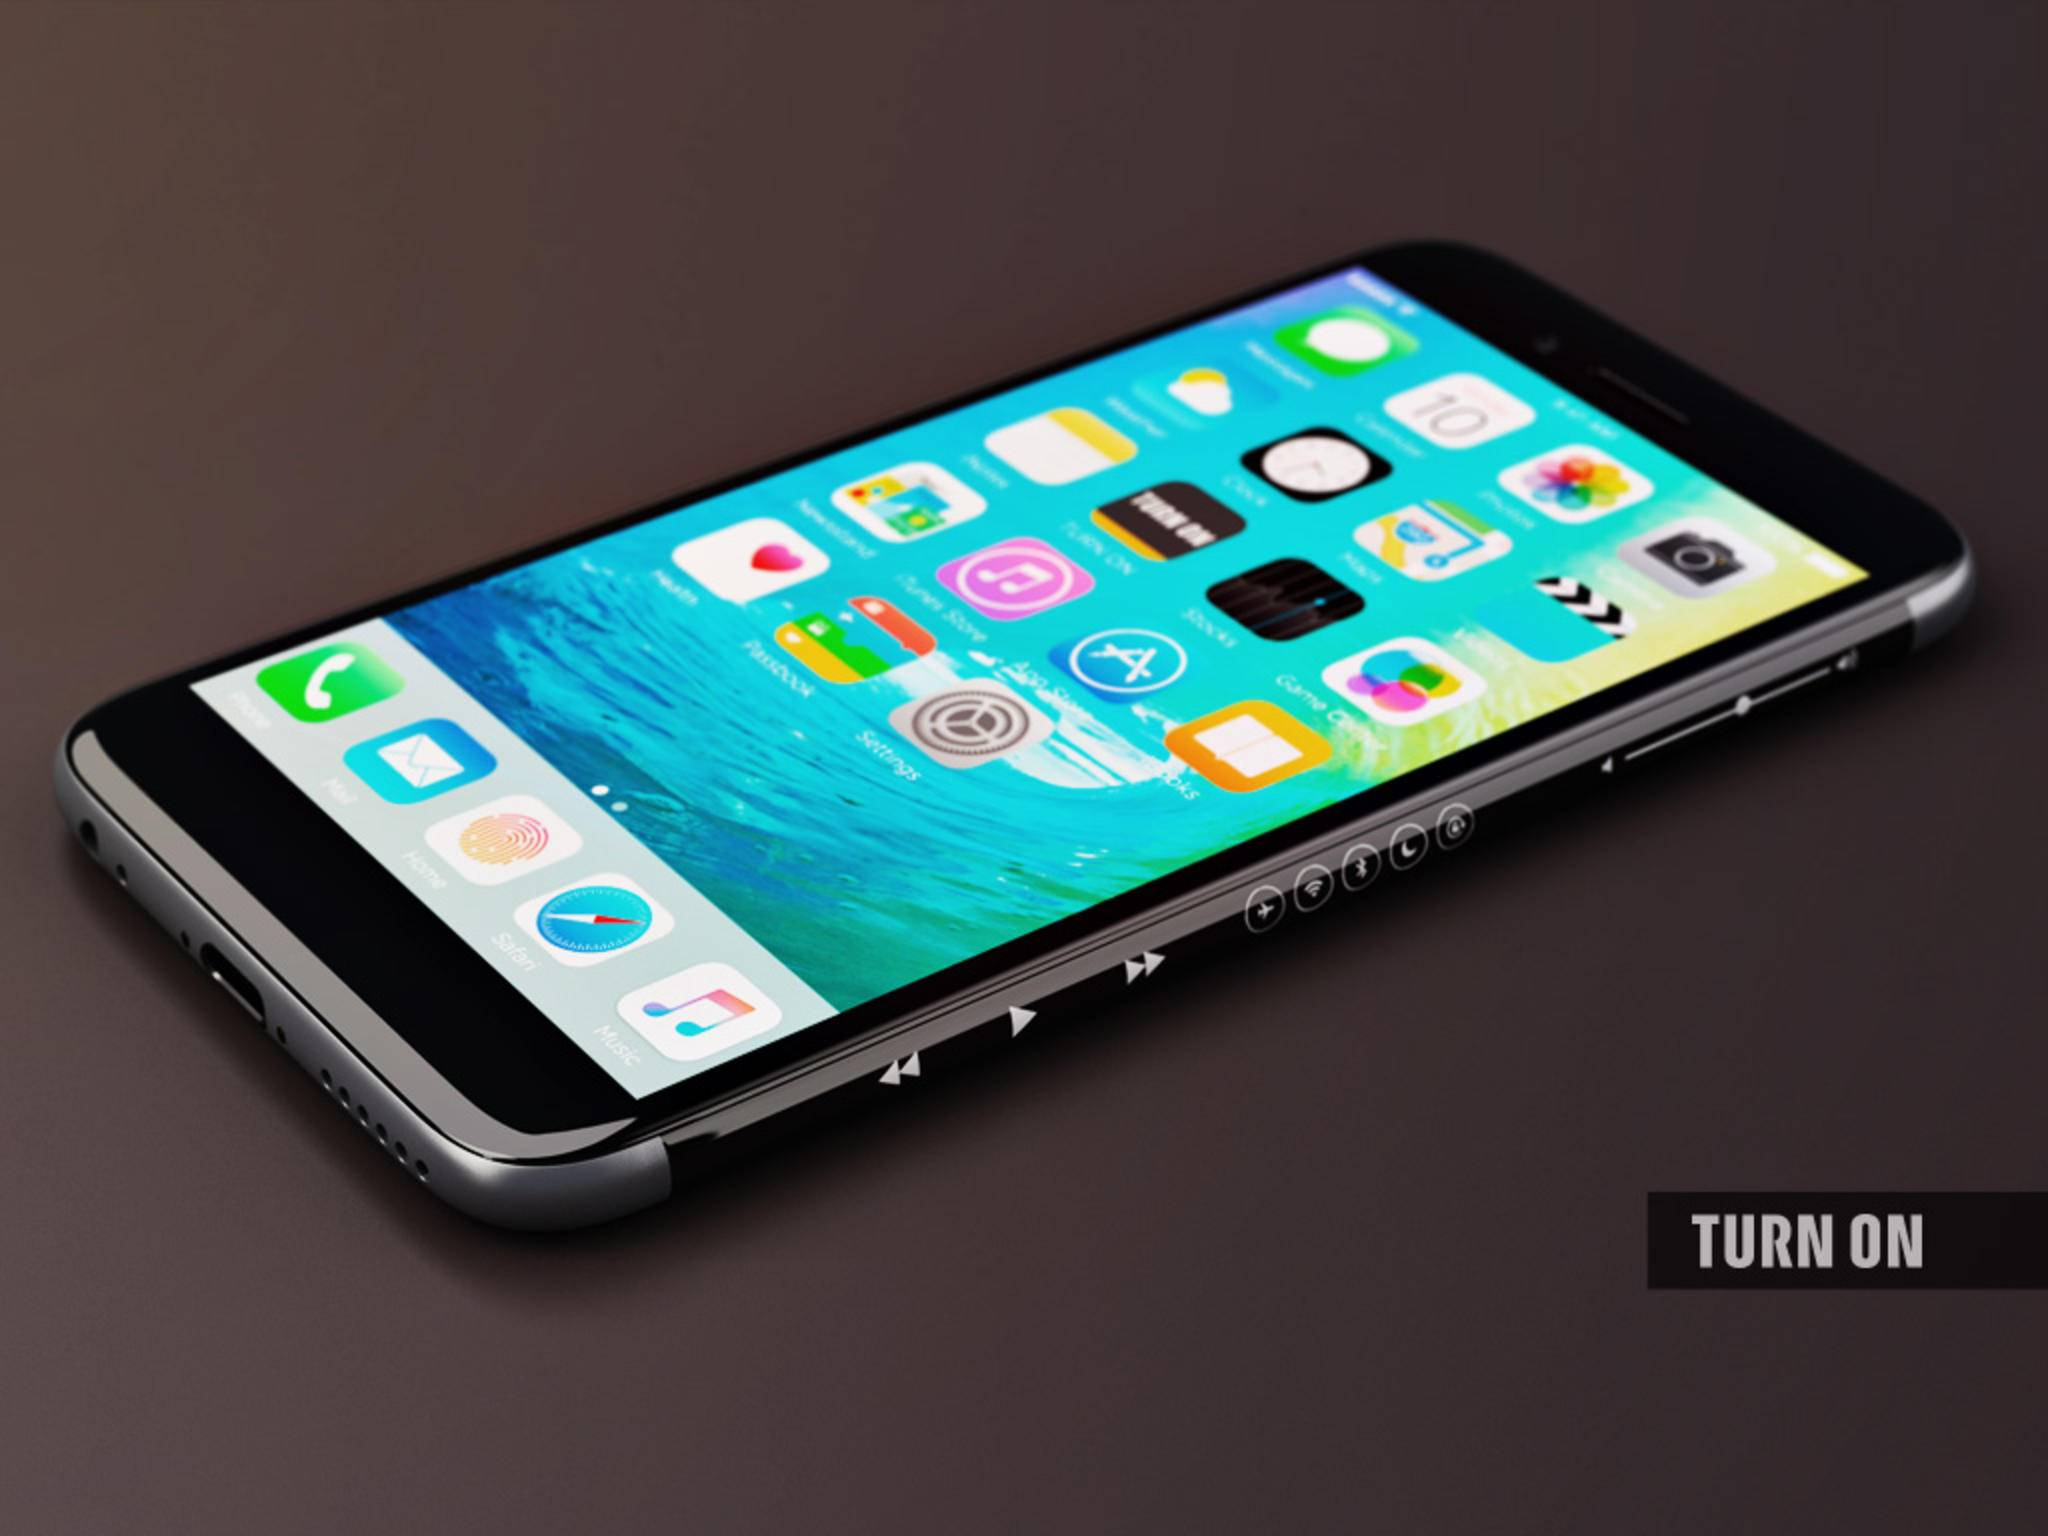 Analyst: iPhone 6s bekommt Selfie-Kamera mit 5 Megapixel